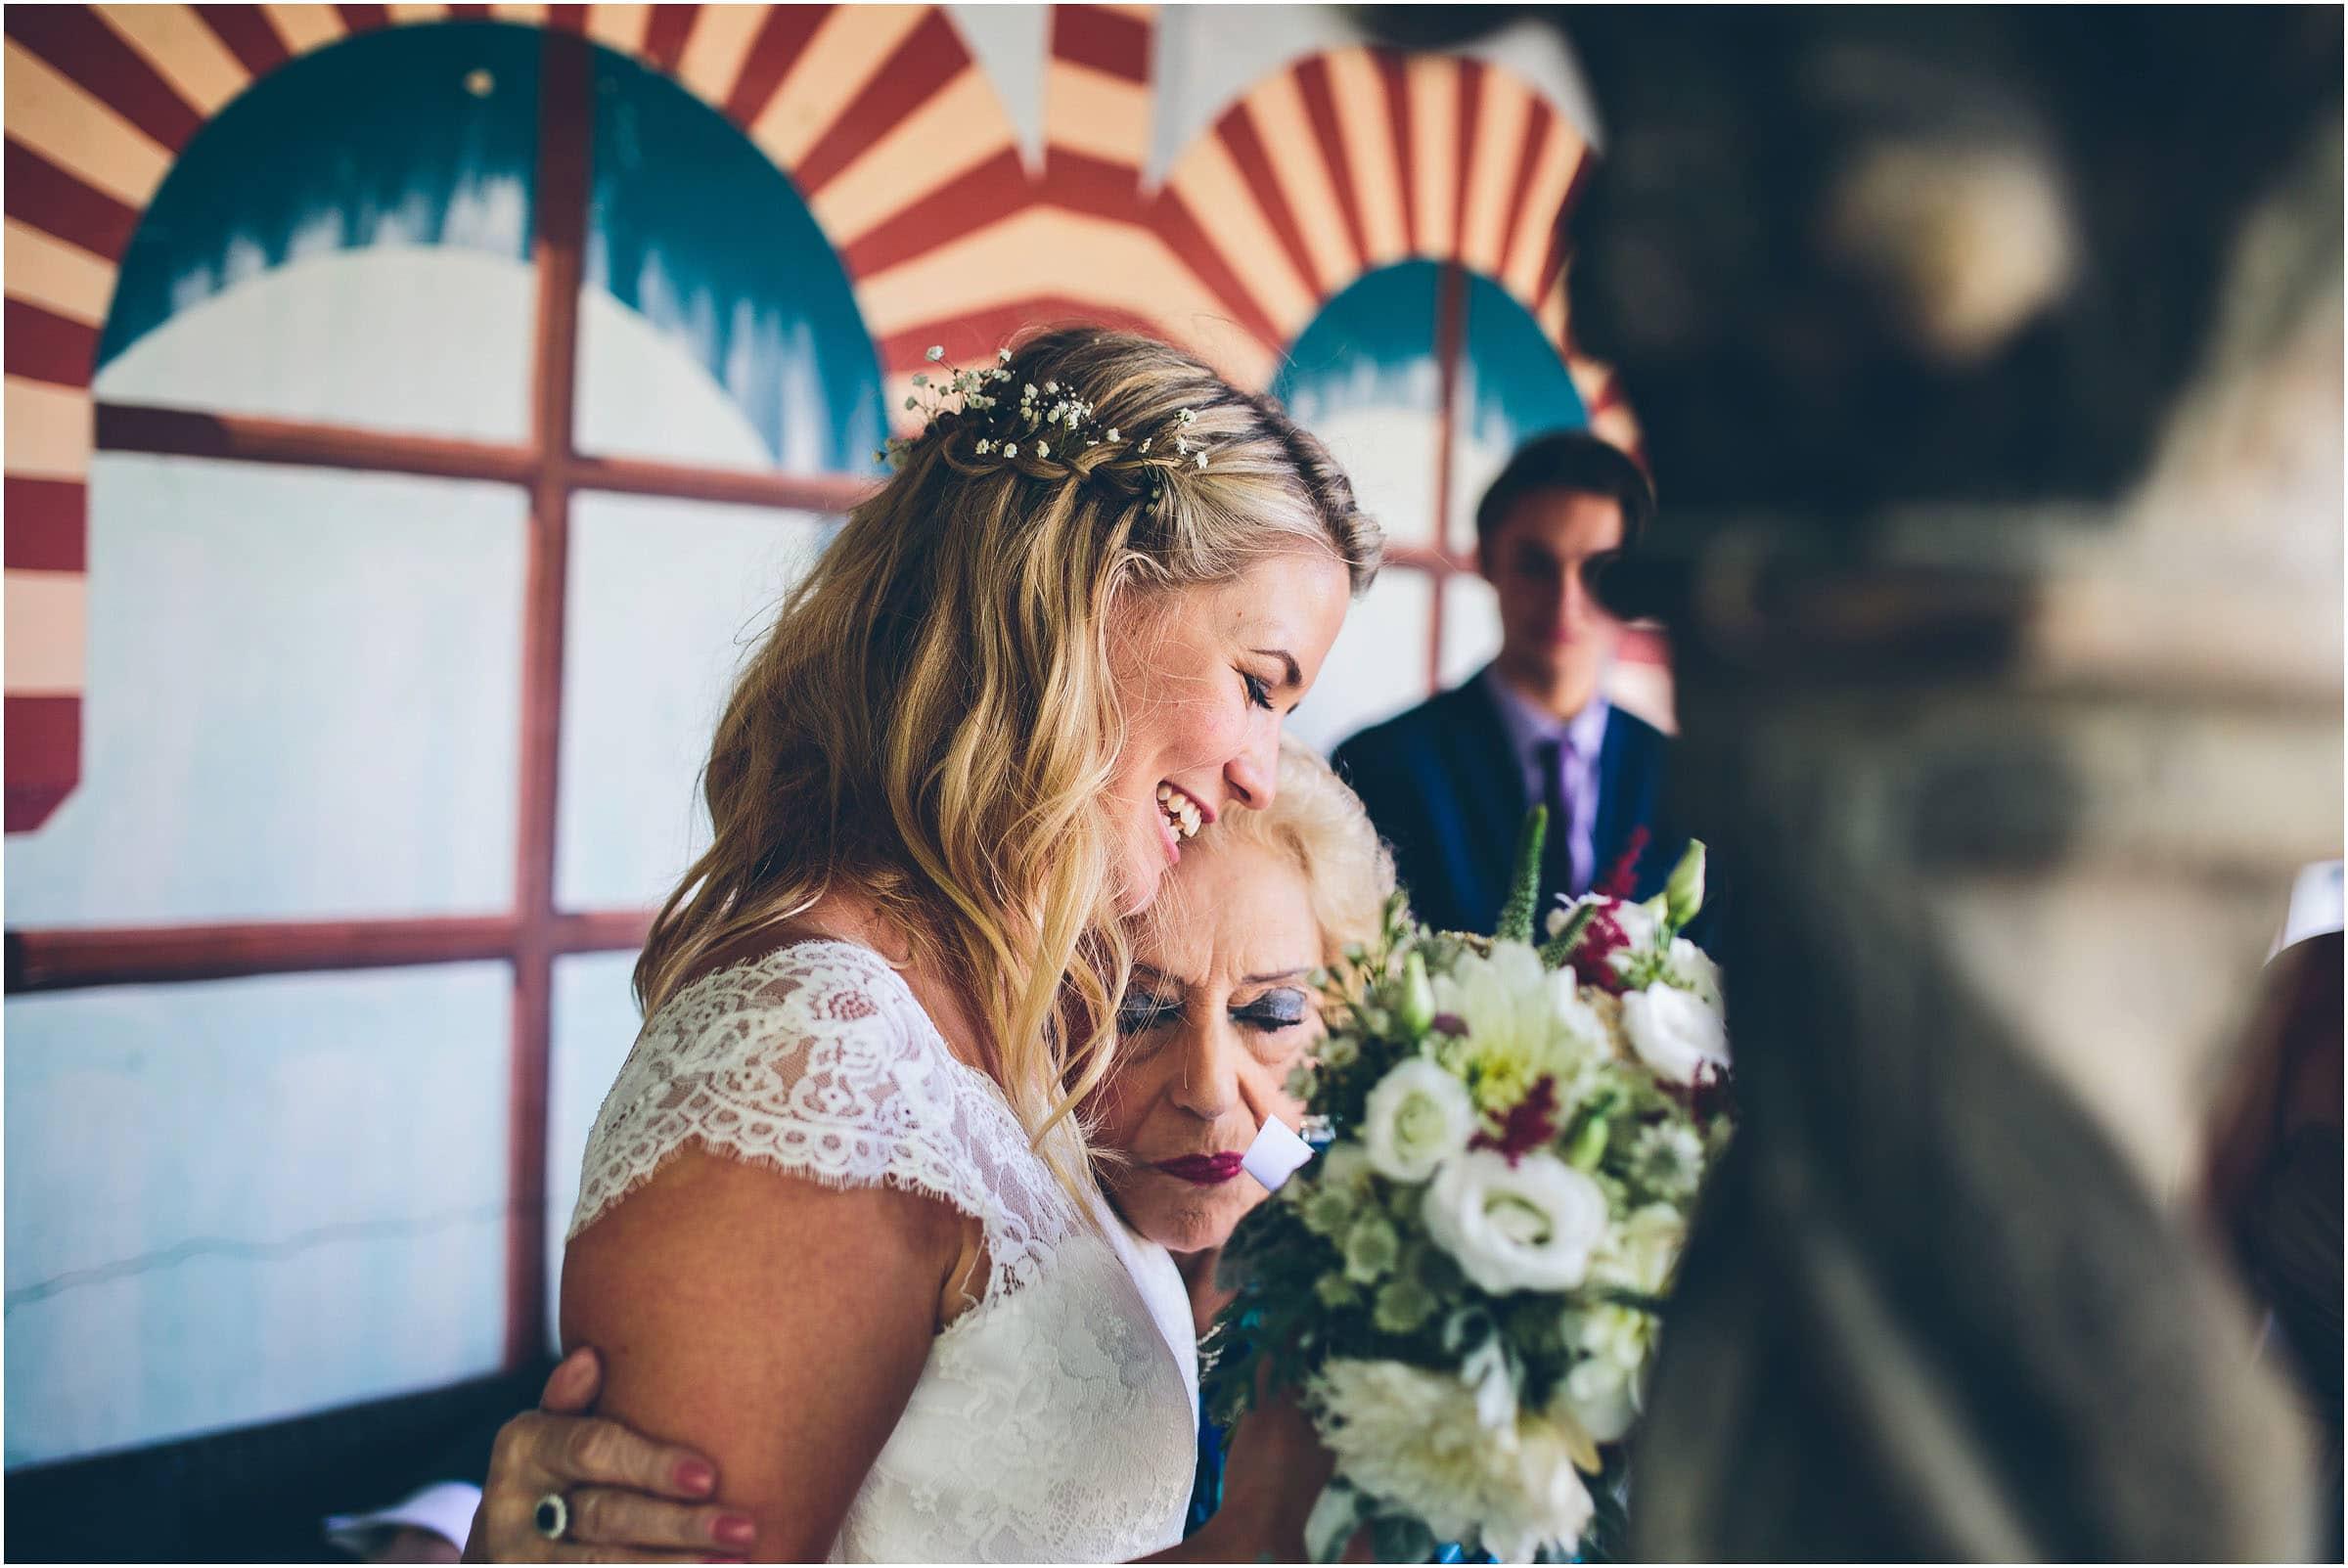 Kensington_Roof_Gardens_Wedding_Photography_0054